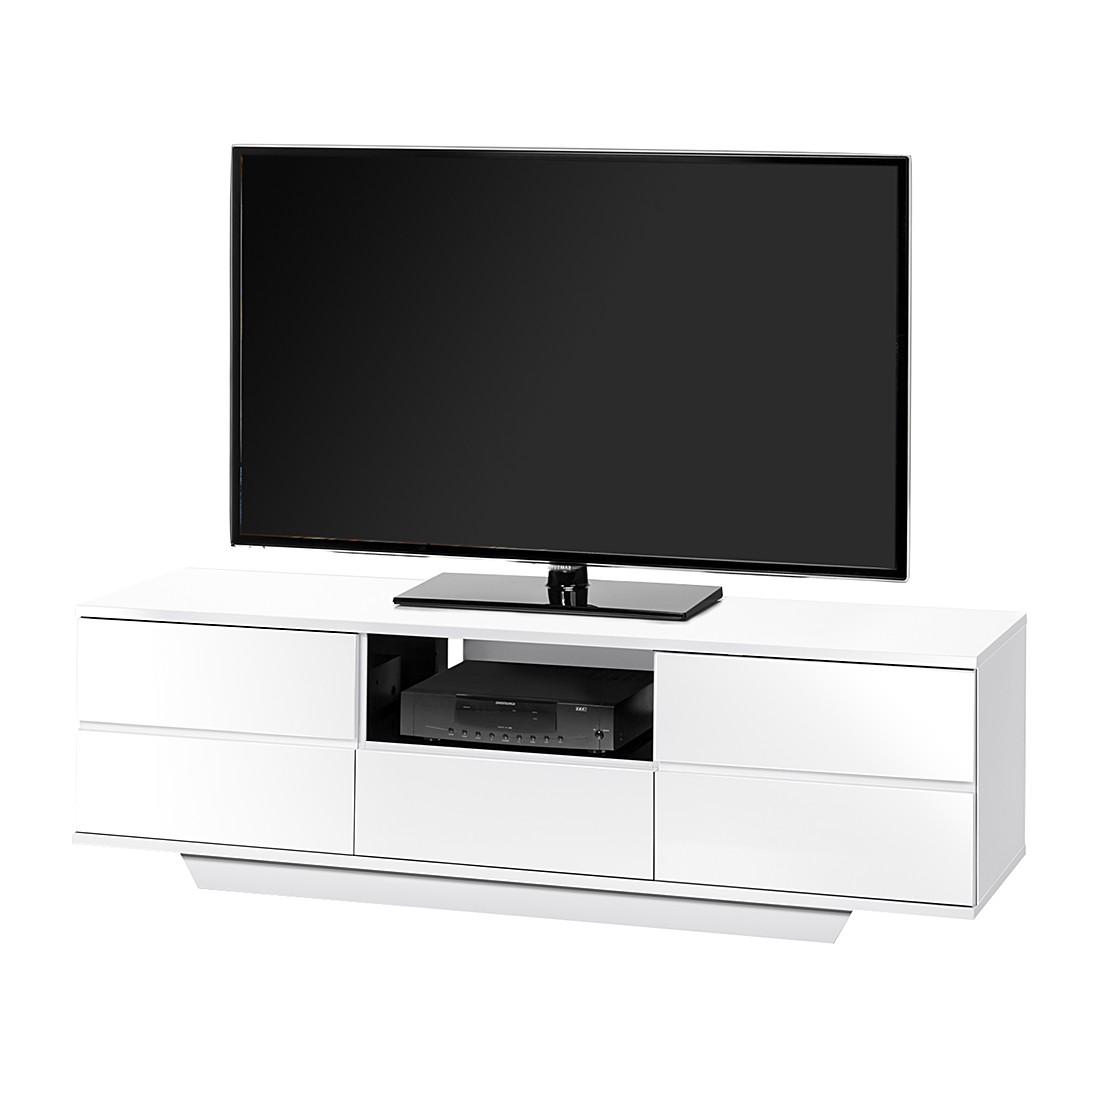 Mobile TV Amieka - Bianco lucido / Nero - 150 cm, Maja Möbel